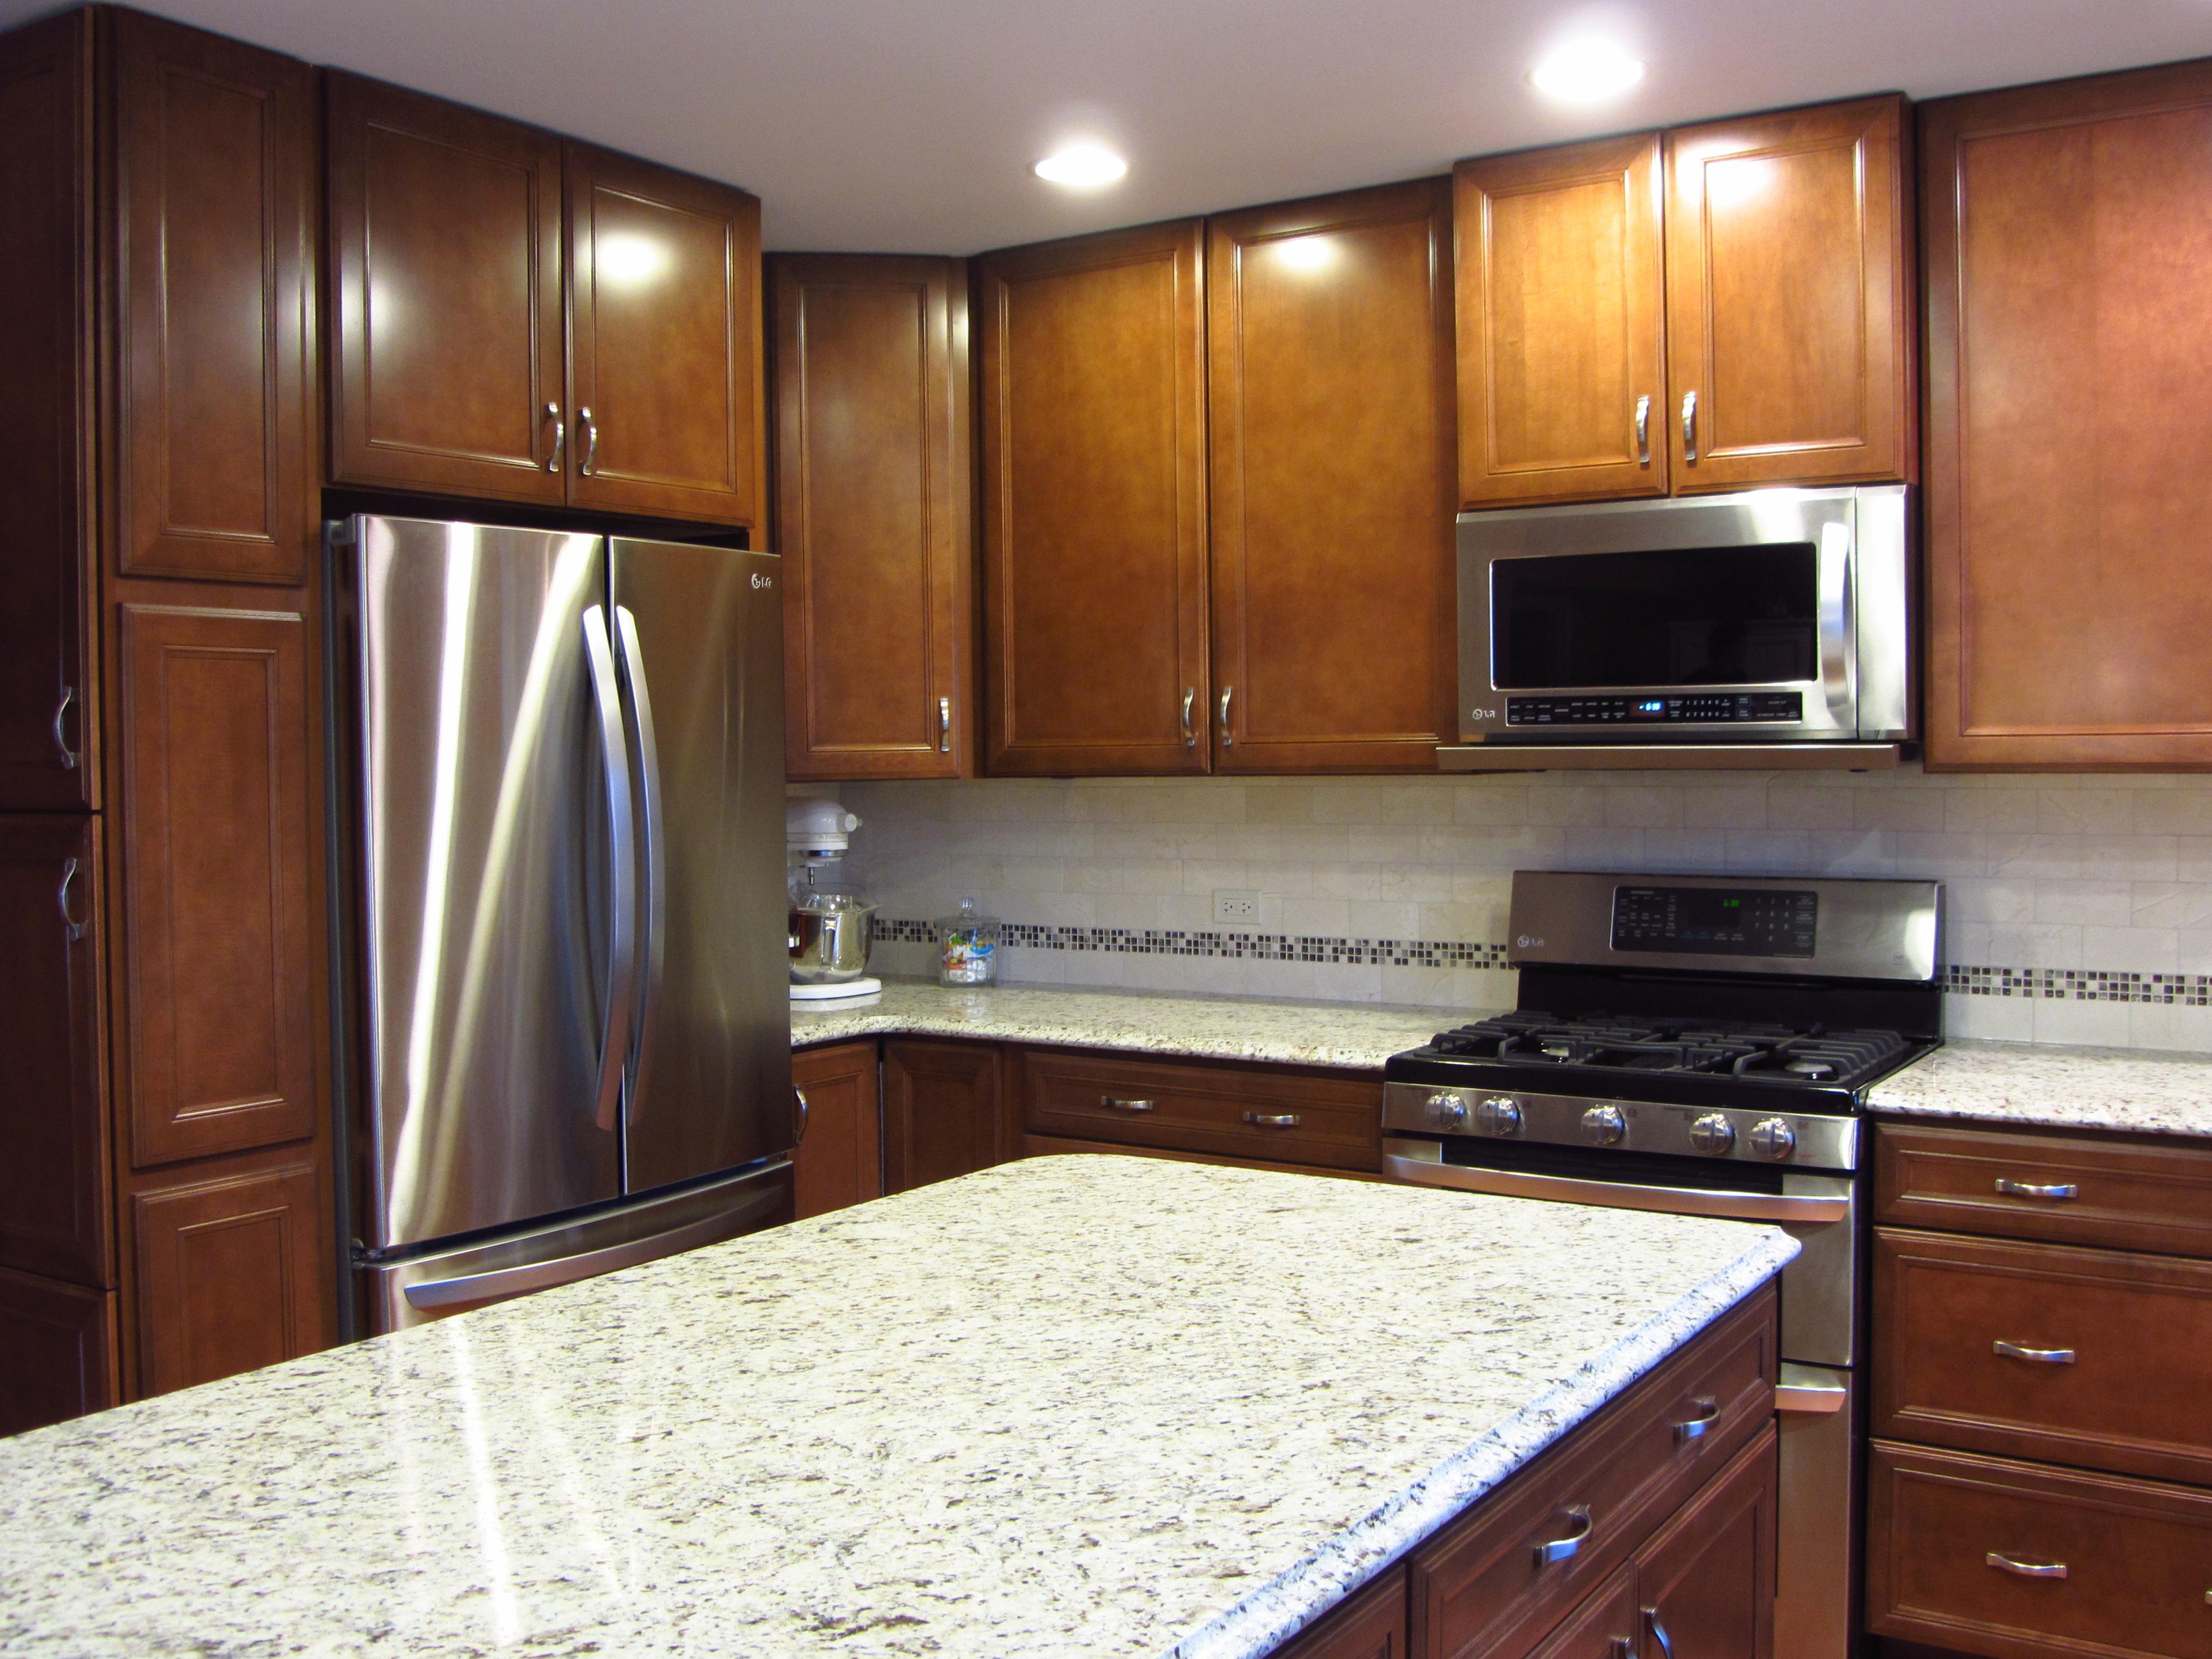 ... 2B Cool Aristokraft Kitchen Cabinets Photos Design Ideas Decoration  Ideas